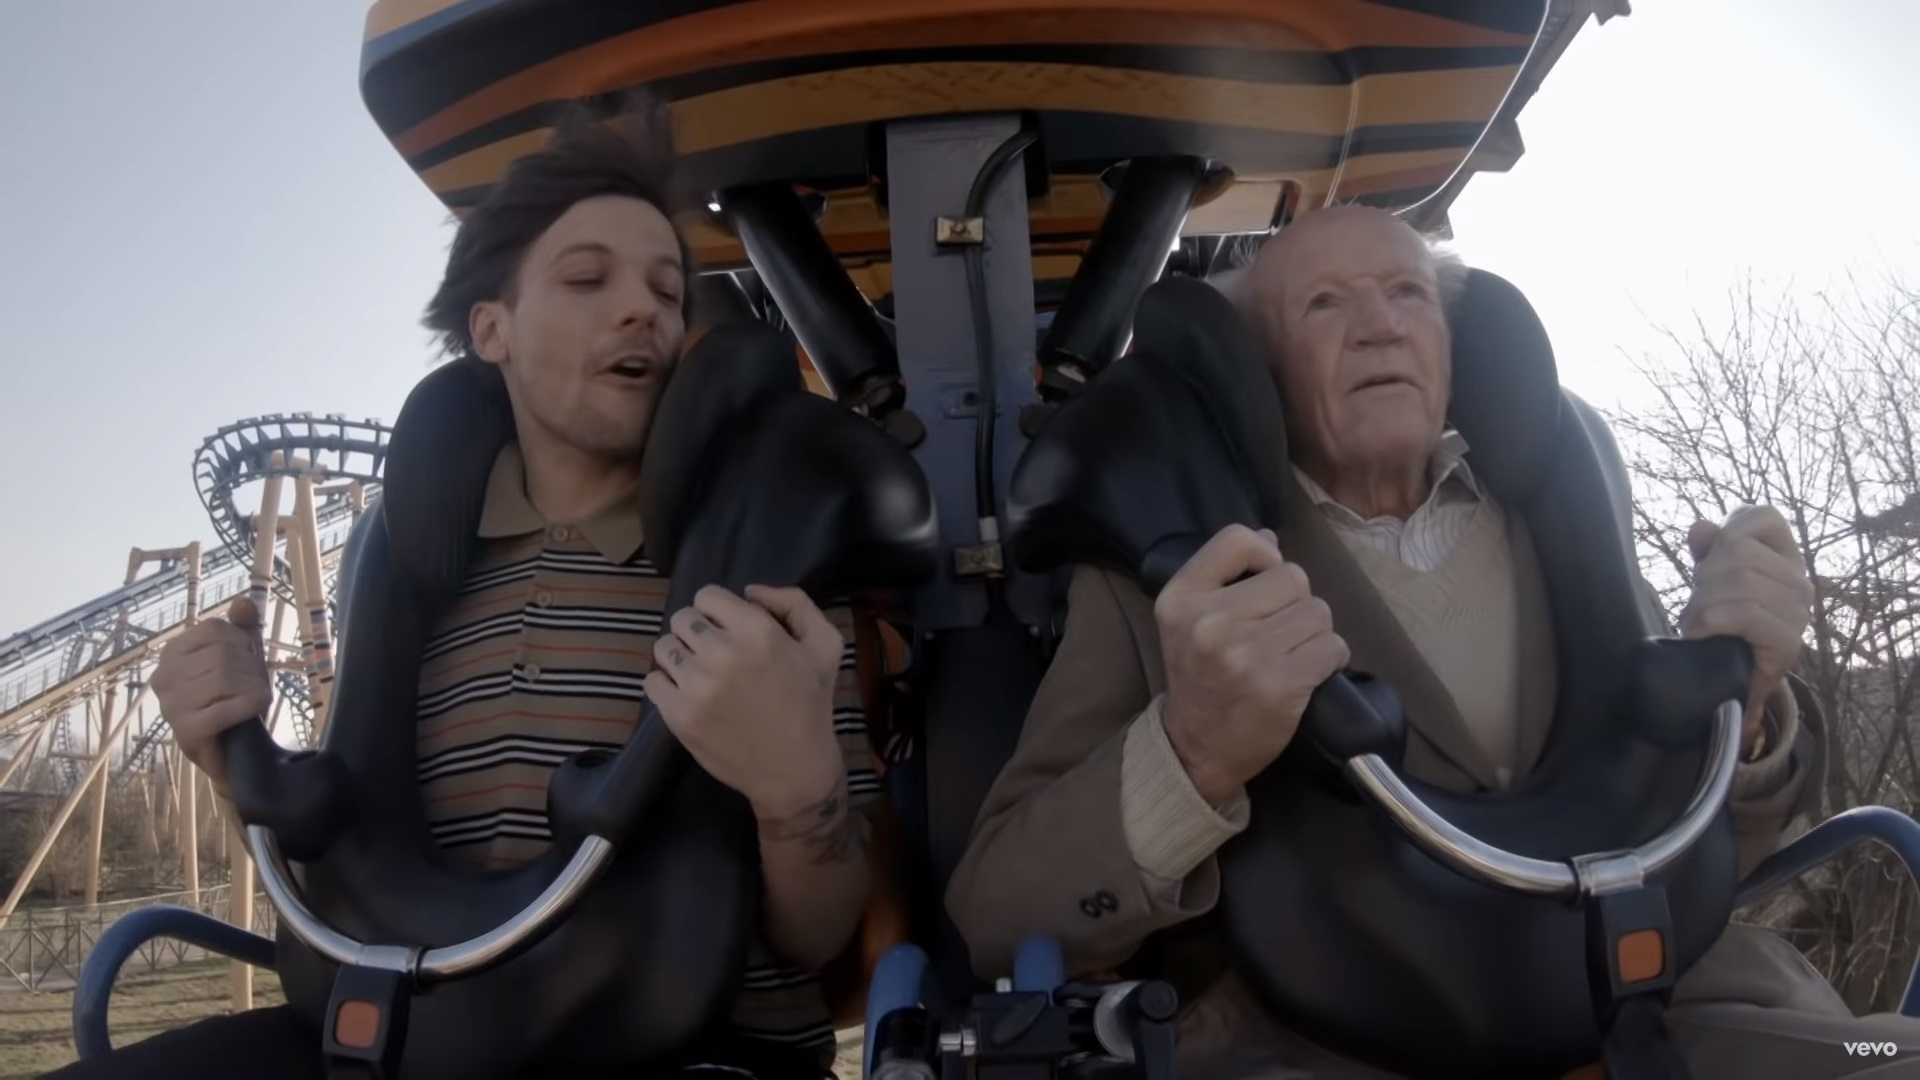 Louis Tomlinson Helps 83 Year Old Full Bucket Checklist In Emotional